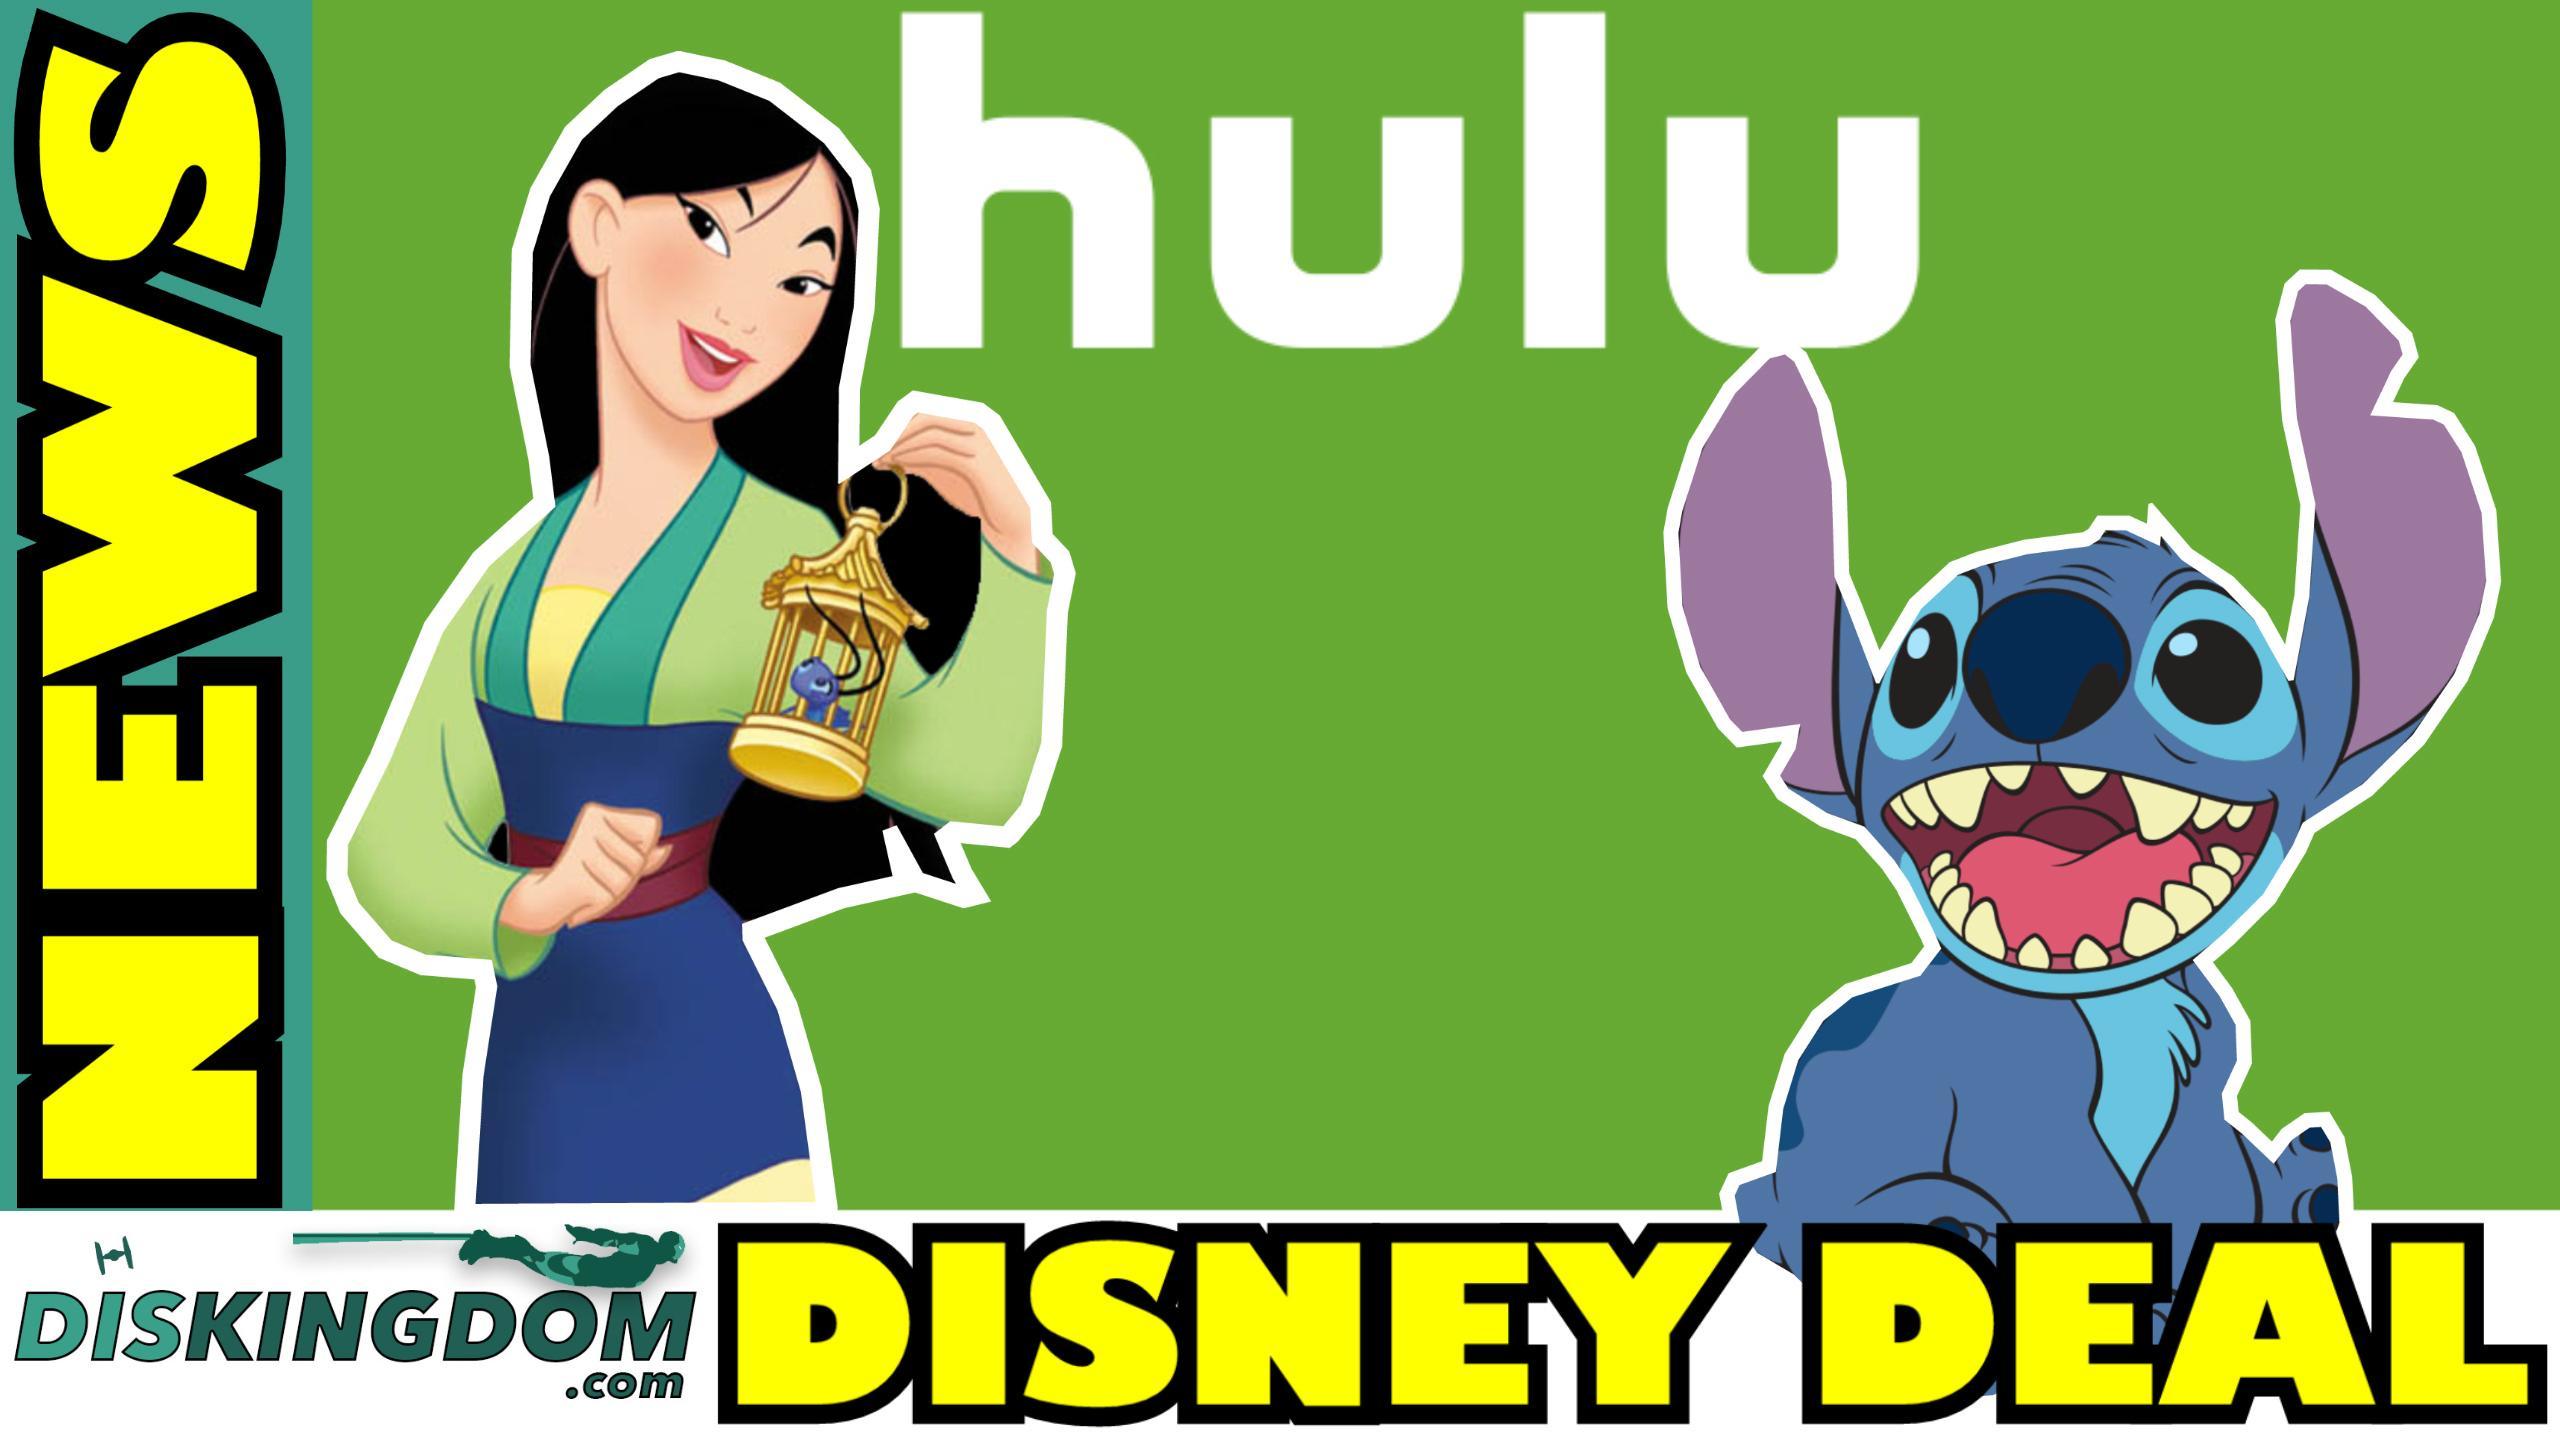 New Show Coming To The Magic Kingdom + Disney Movies Join Hulu | DK Disney News